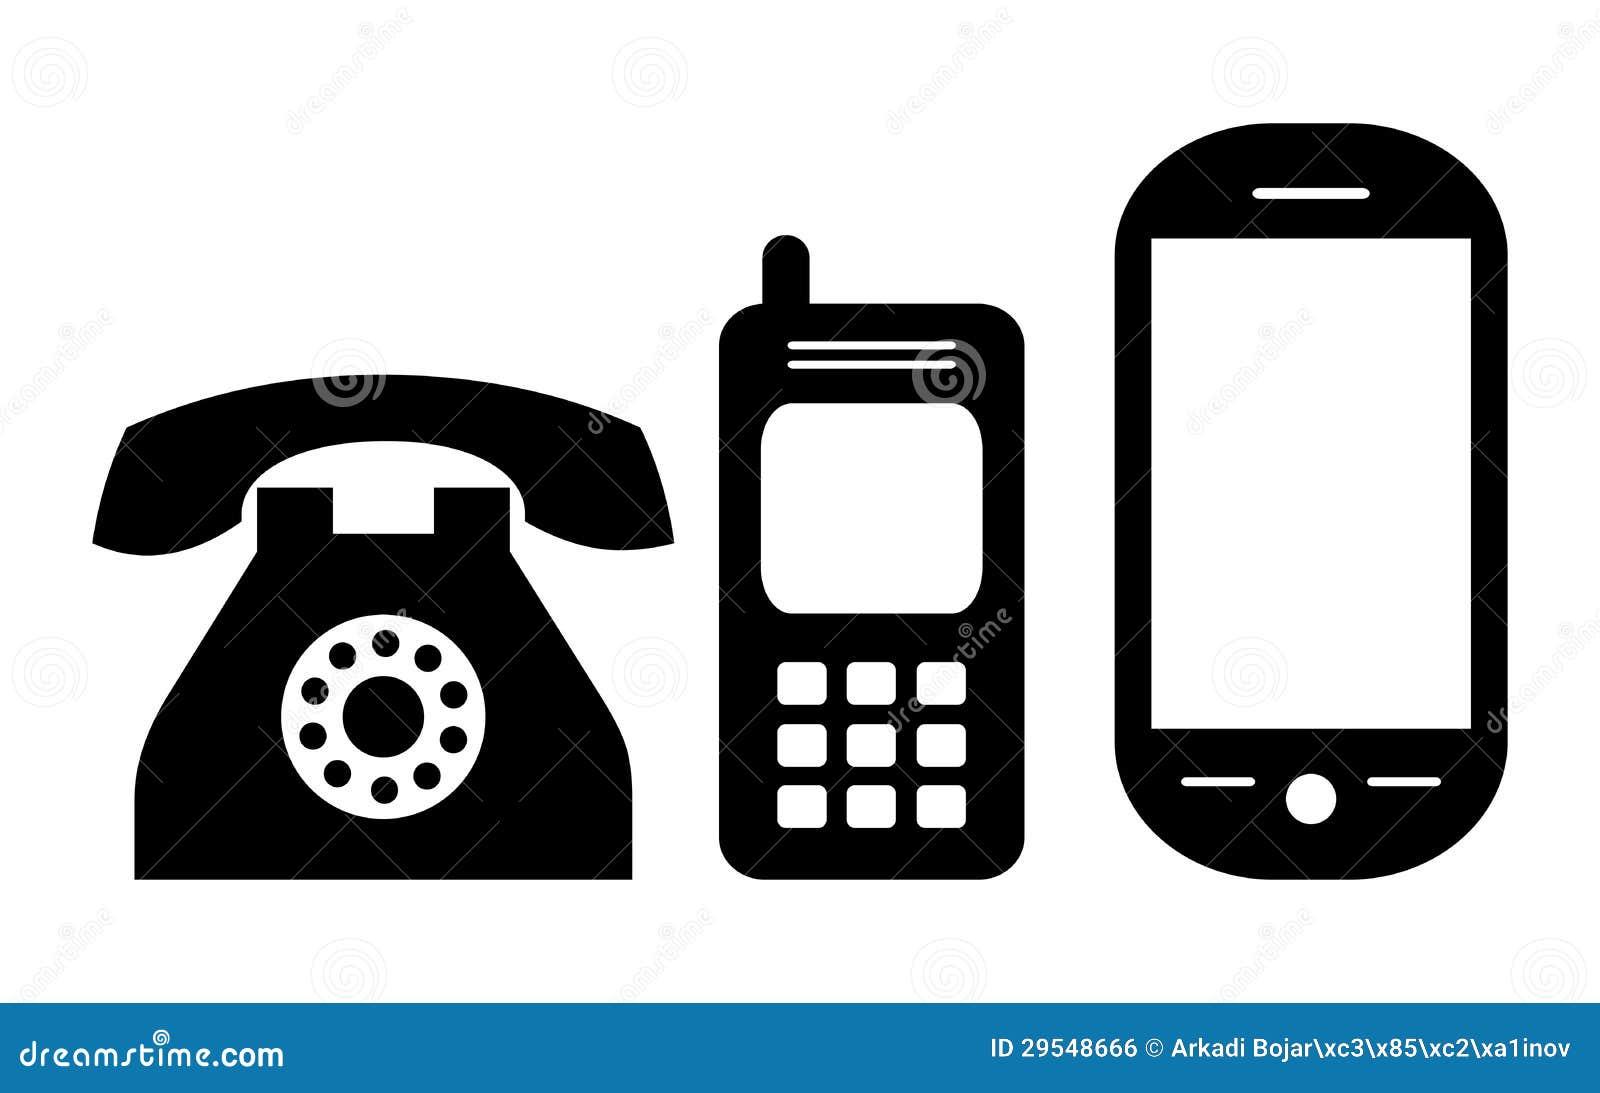 Phone Icon Stock Vector Illustration Of Cellphone Retro 29548666